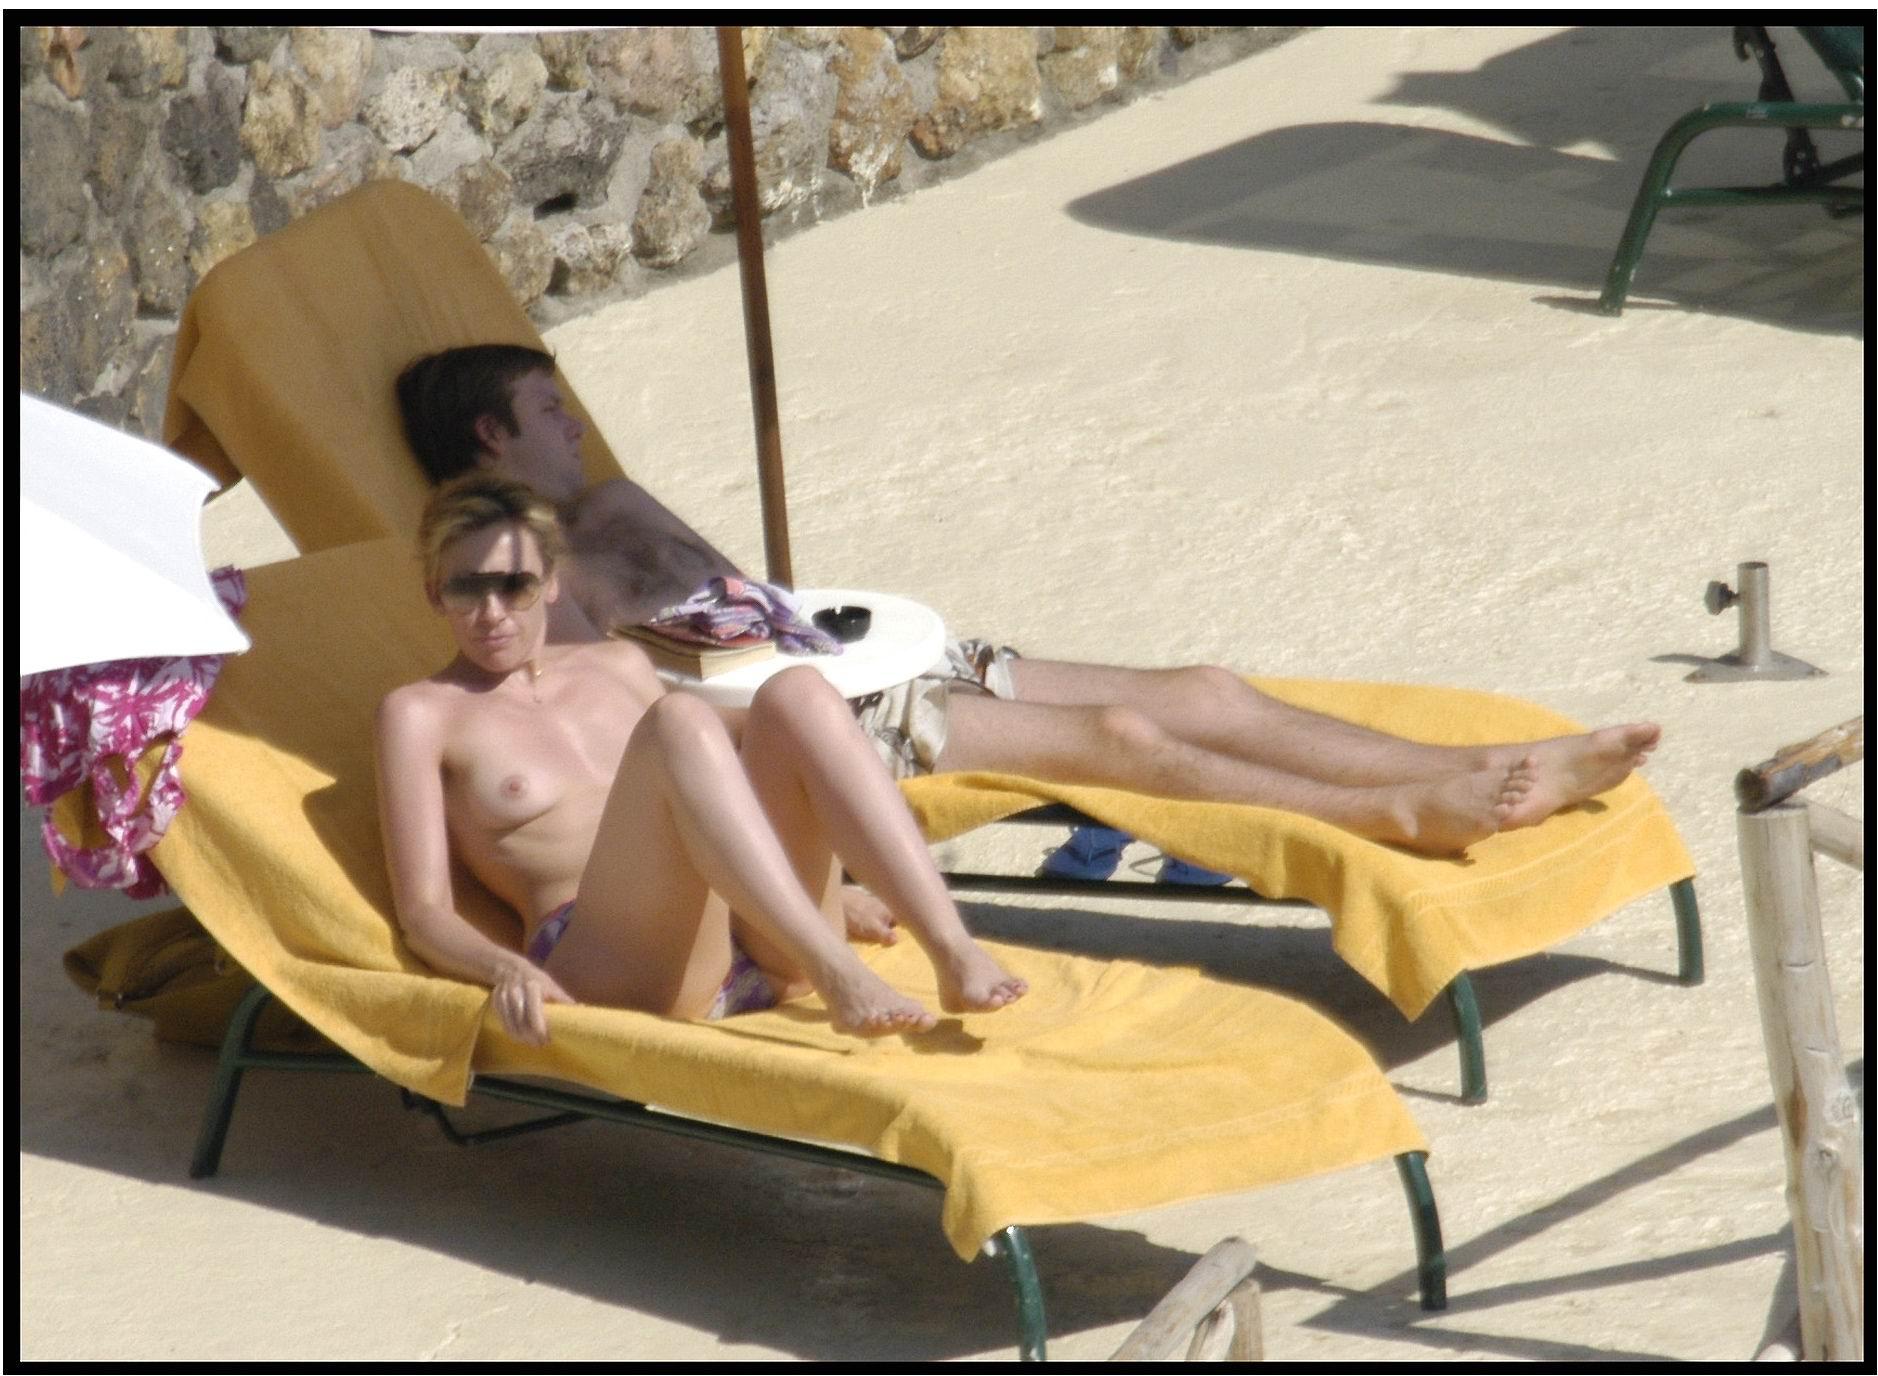 Toni Collette Desnuda Página 4 Fotos Desnuda Descuido Topless